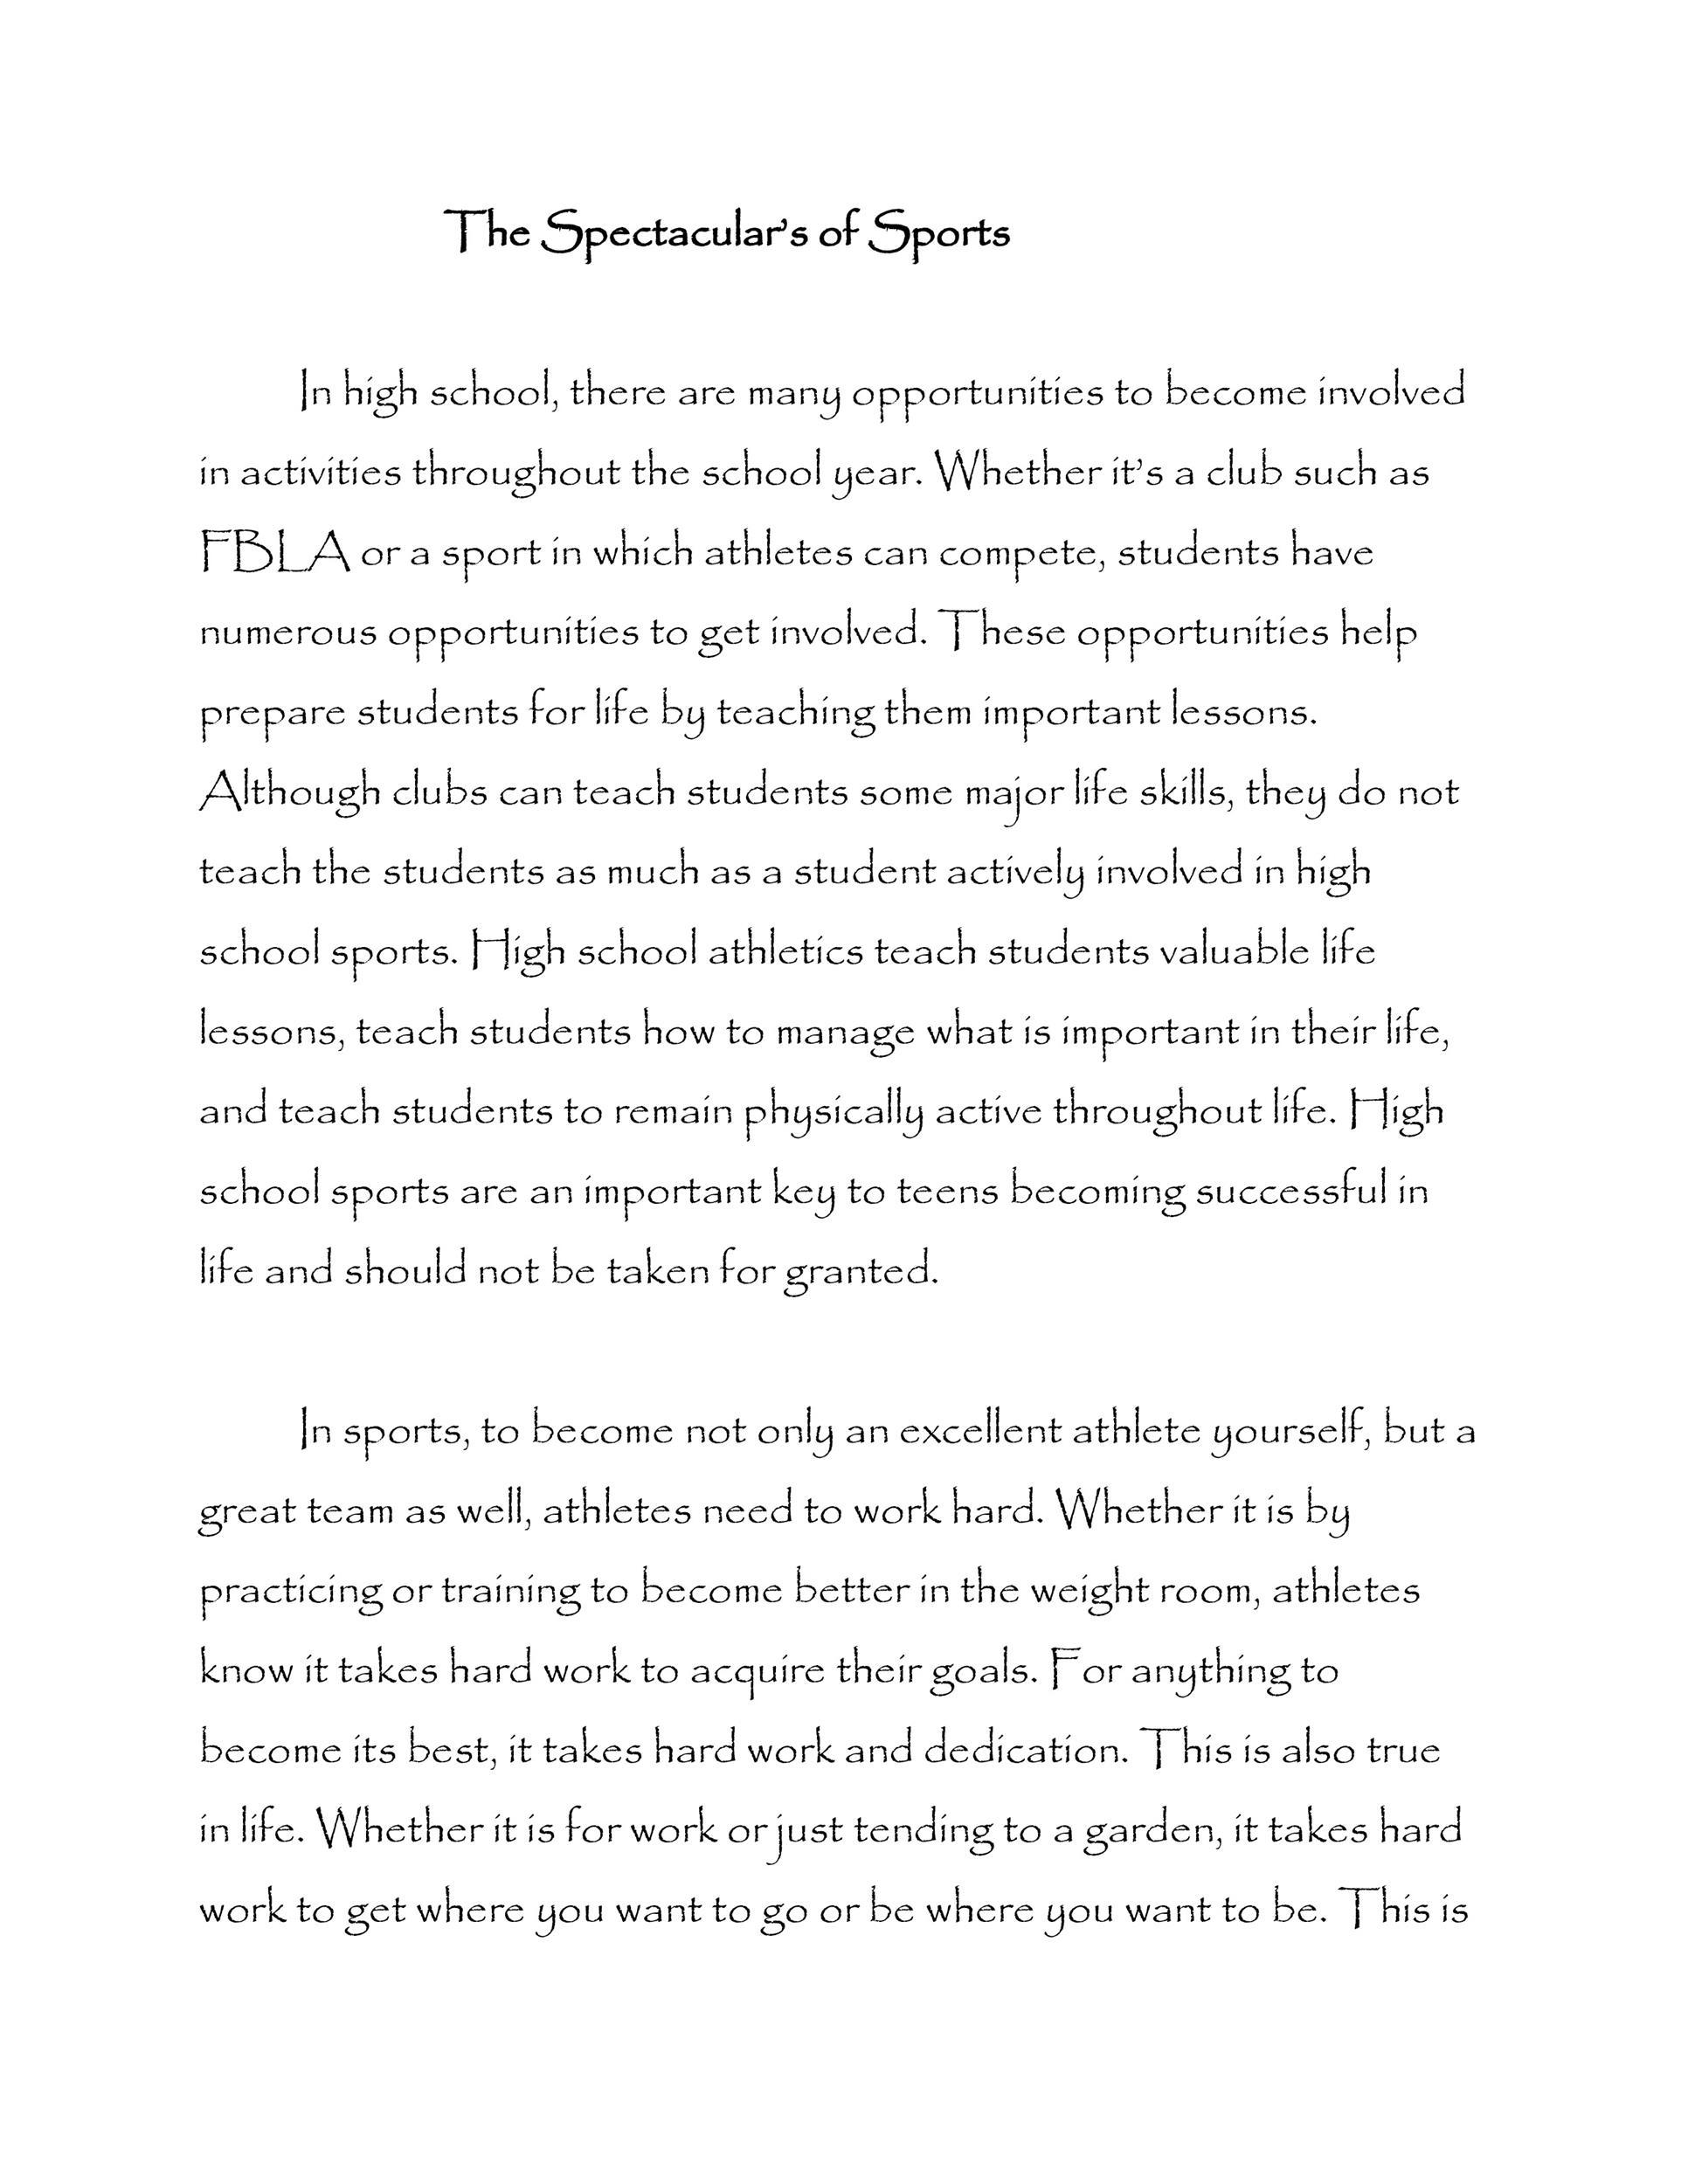 Free persuasive essay example 35